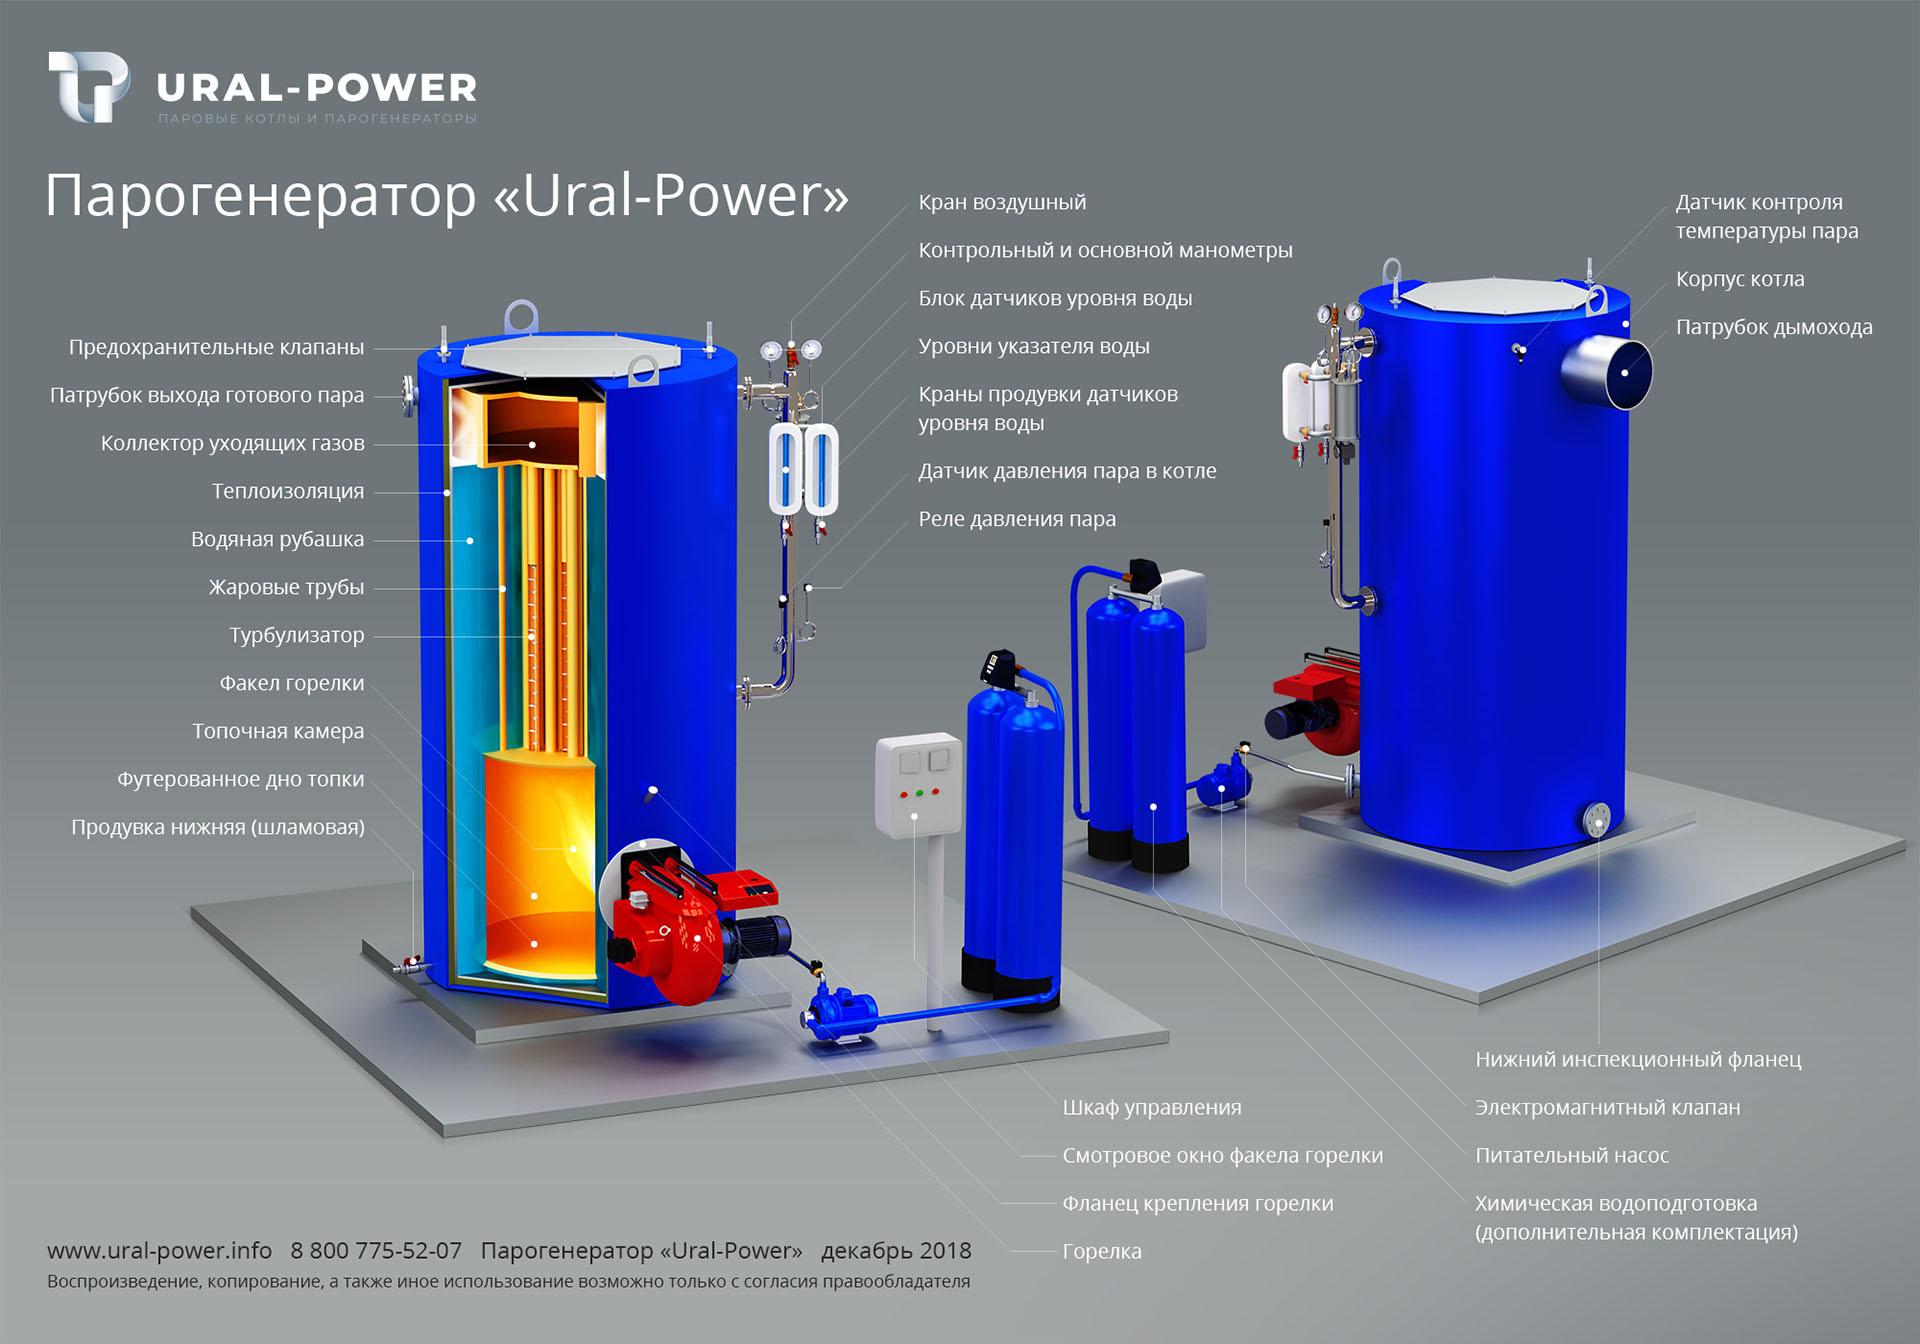 Парогенератор на газе URAL-POWER в разрезе